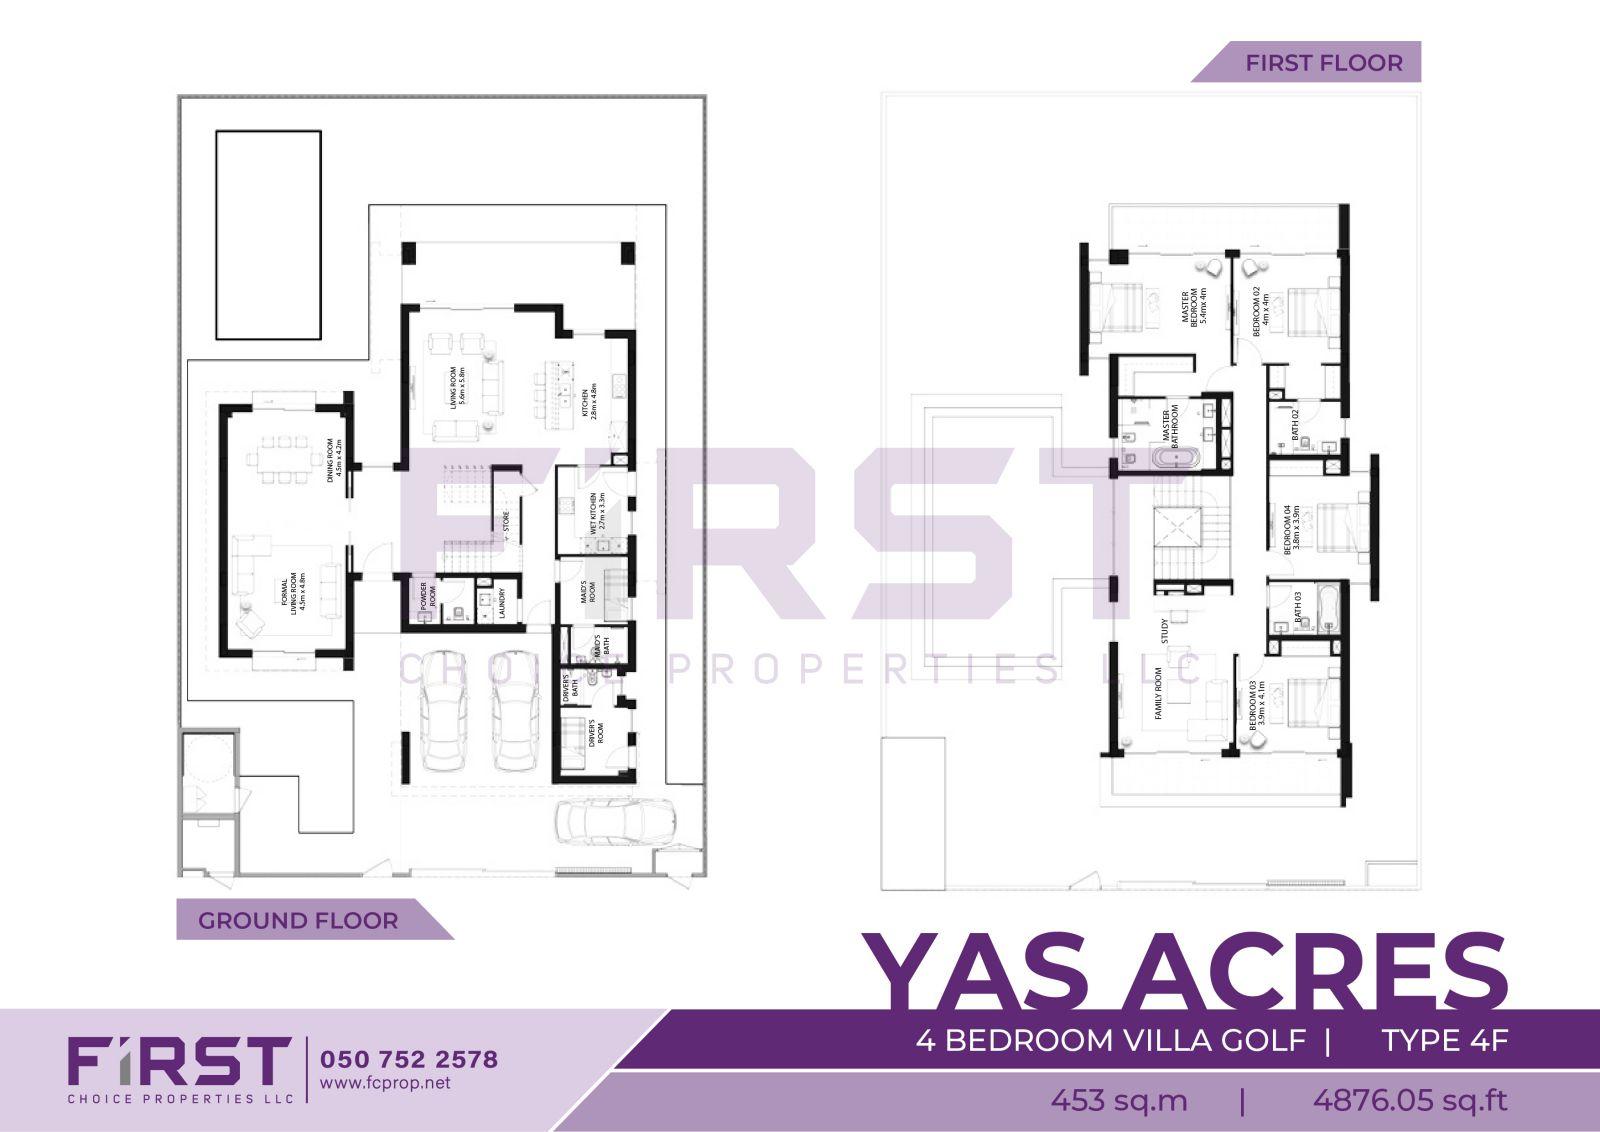 Floor Plan of 4 Bedroom Villa Golf Type 4F in Yas Acres Yas Island Abu Dhabi UAE 453 sq.m 4876.05 sq.ft.jpg